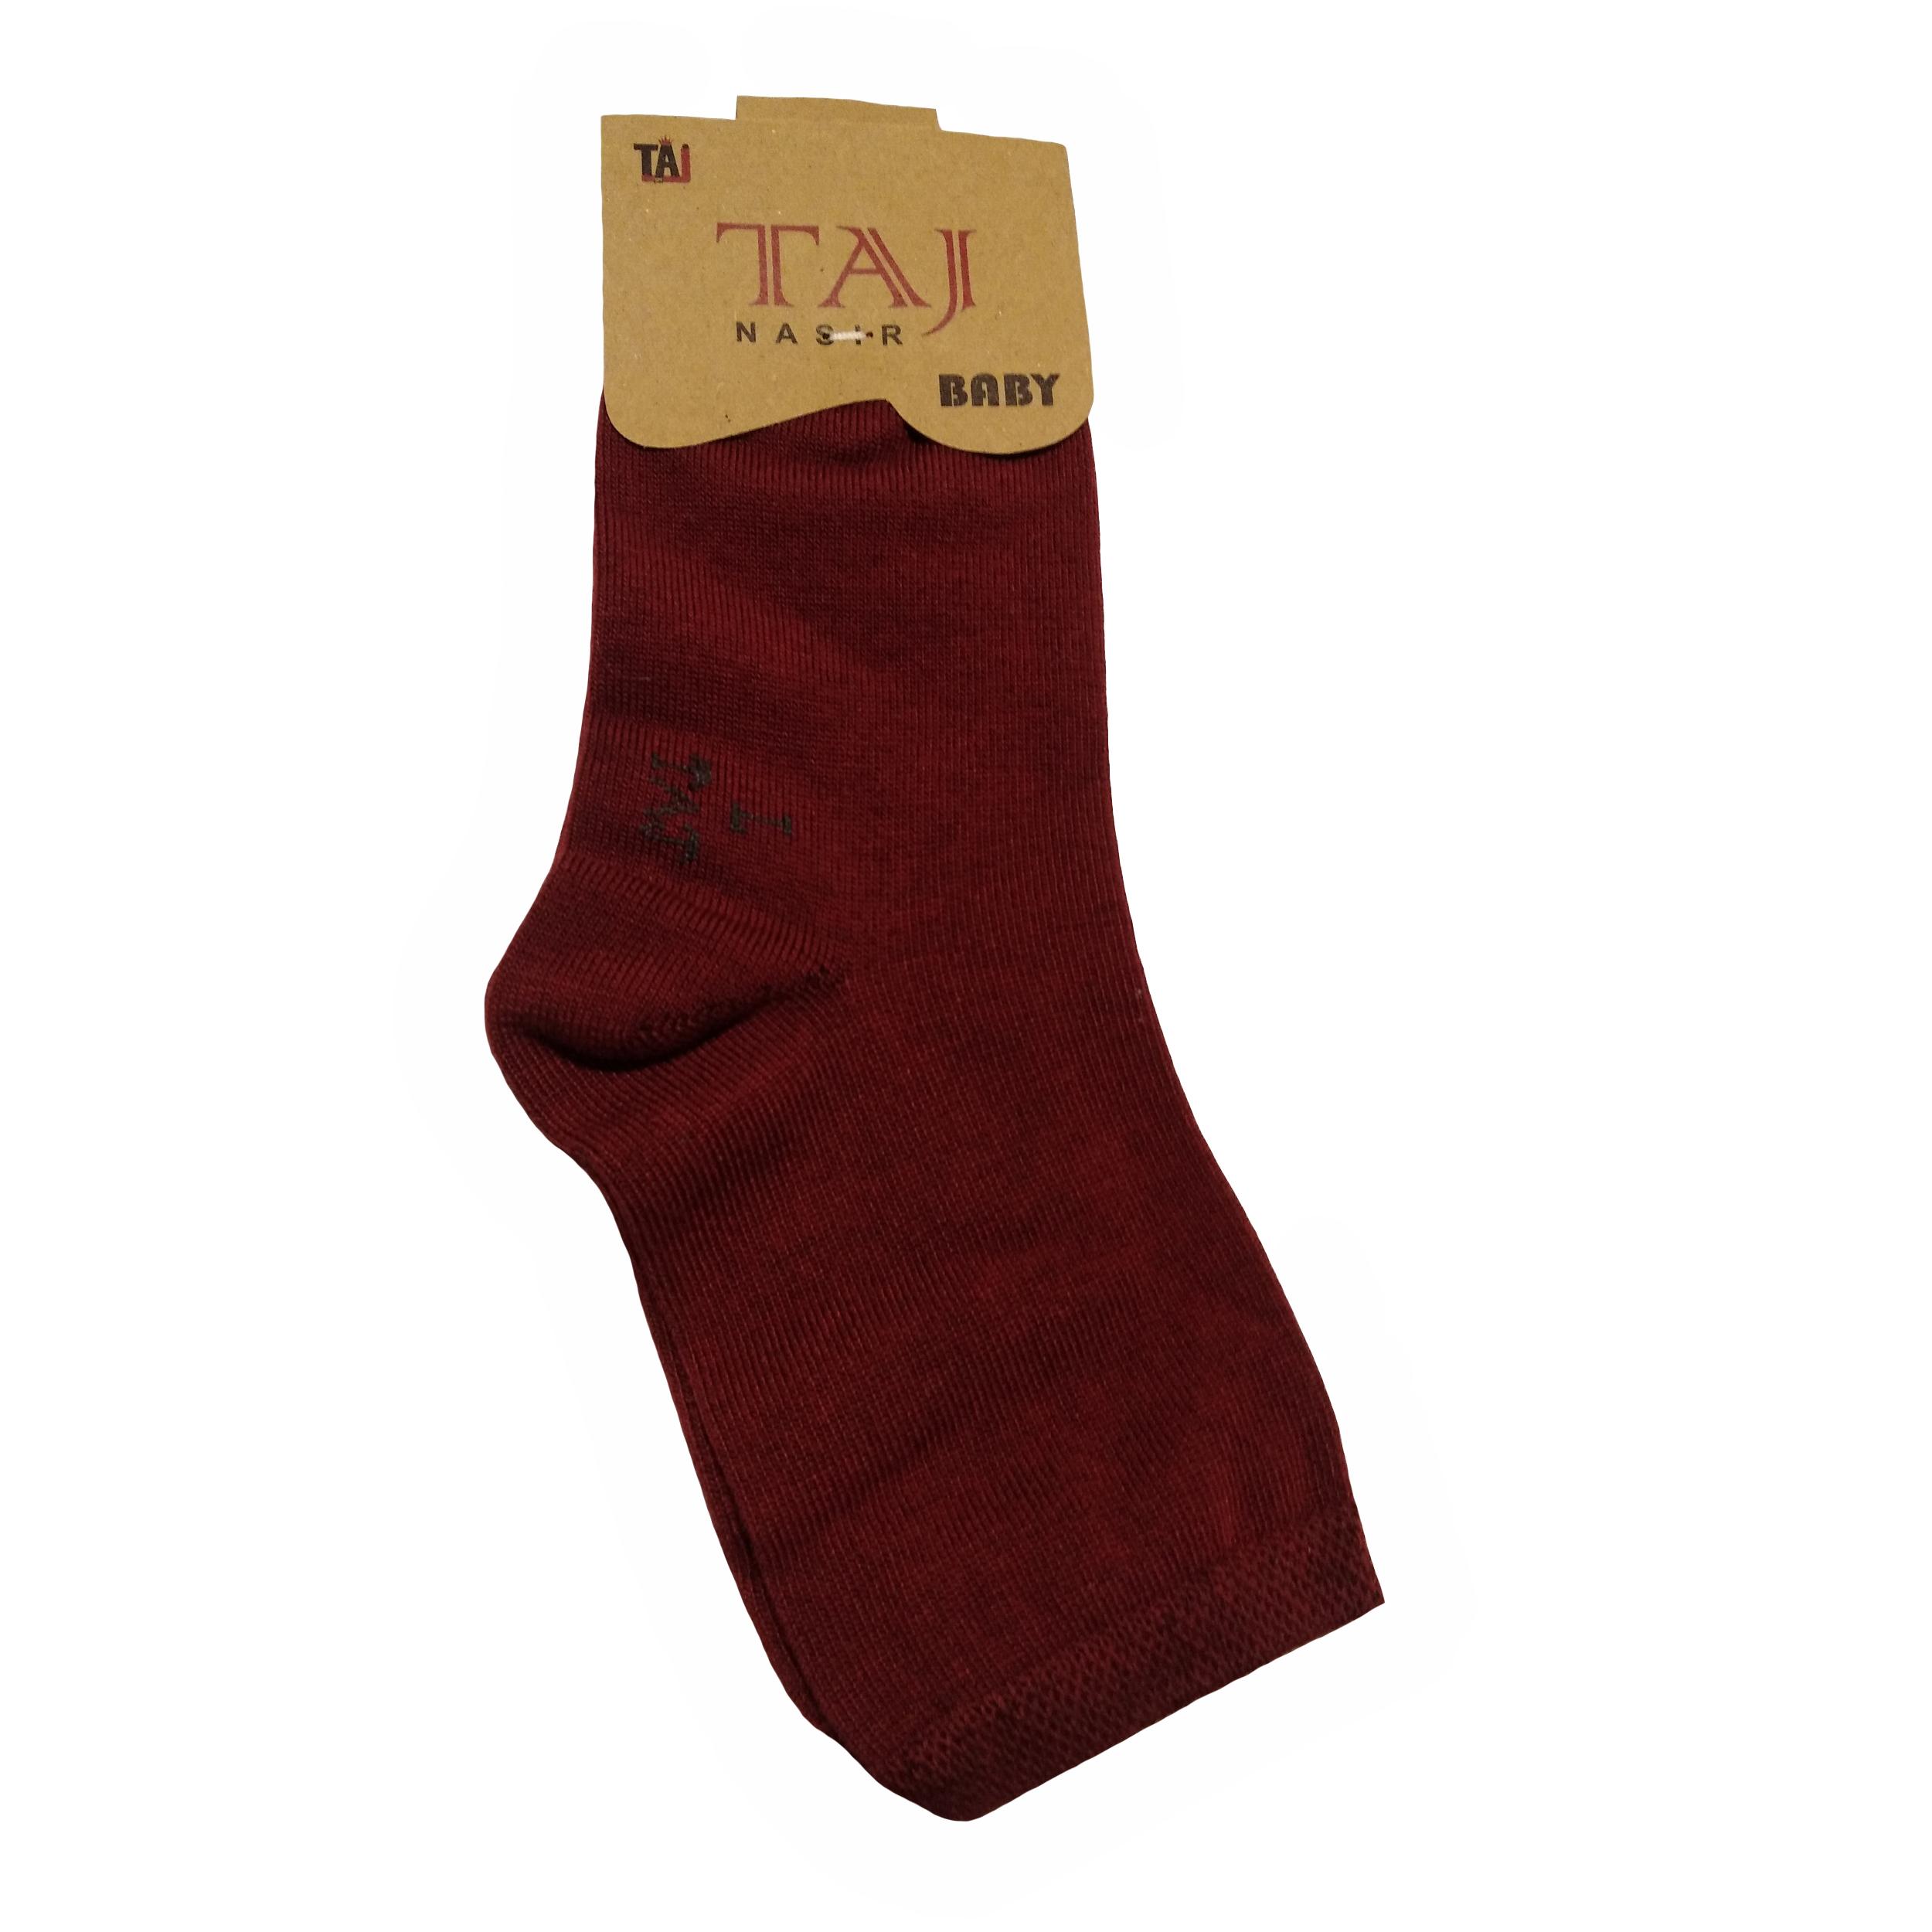 جوراب بچگانه تاج مدل P-1